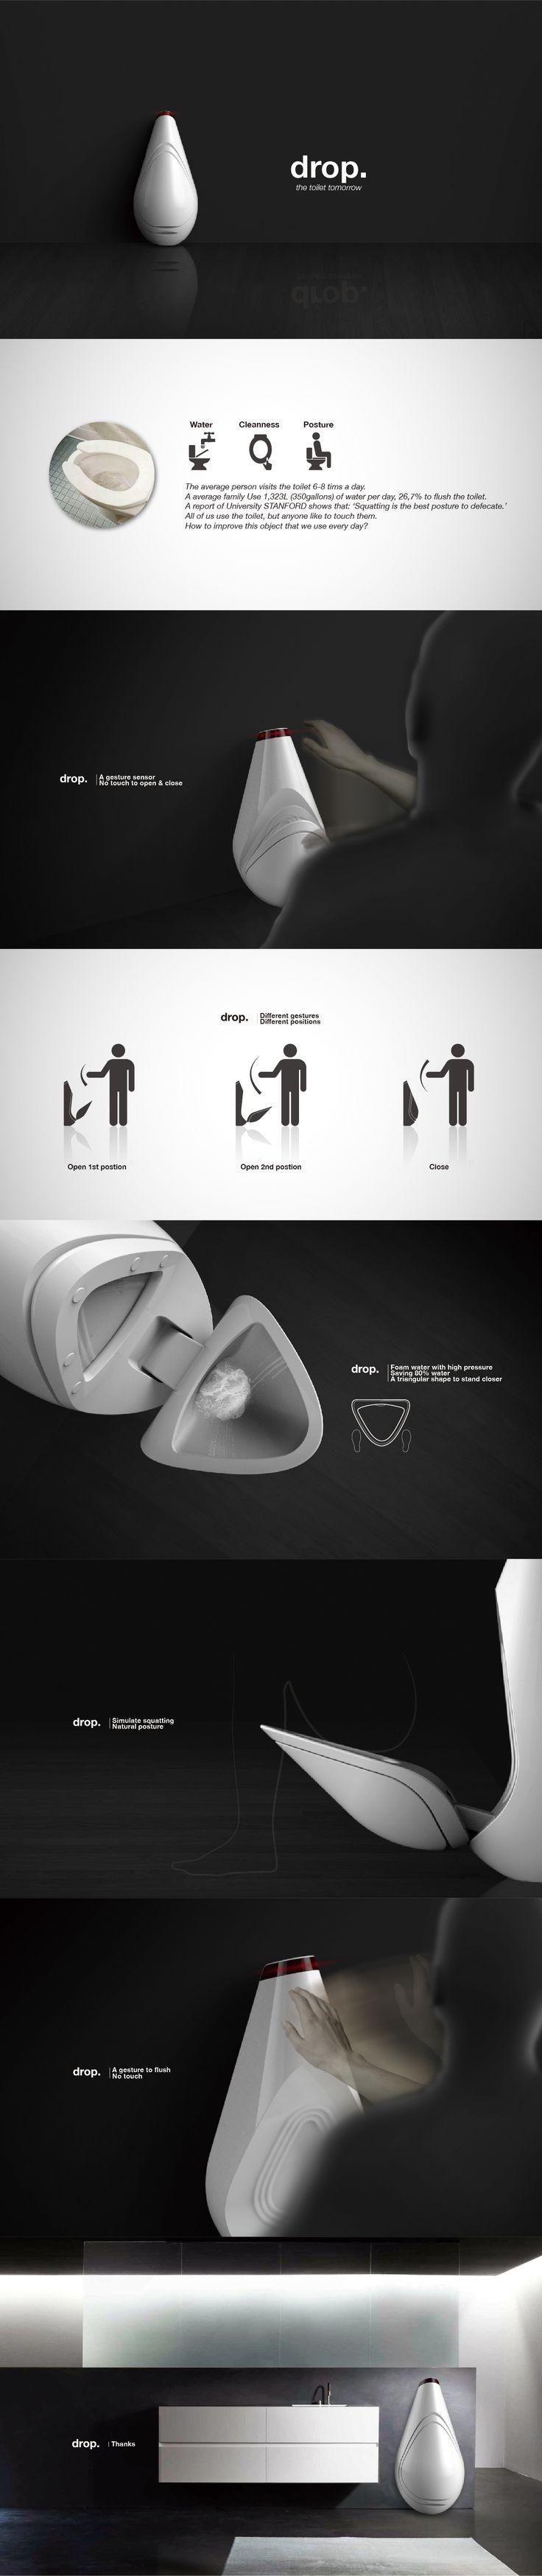 Drop, a prospective concept. 2013 Personal project.